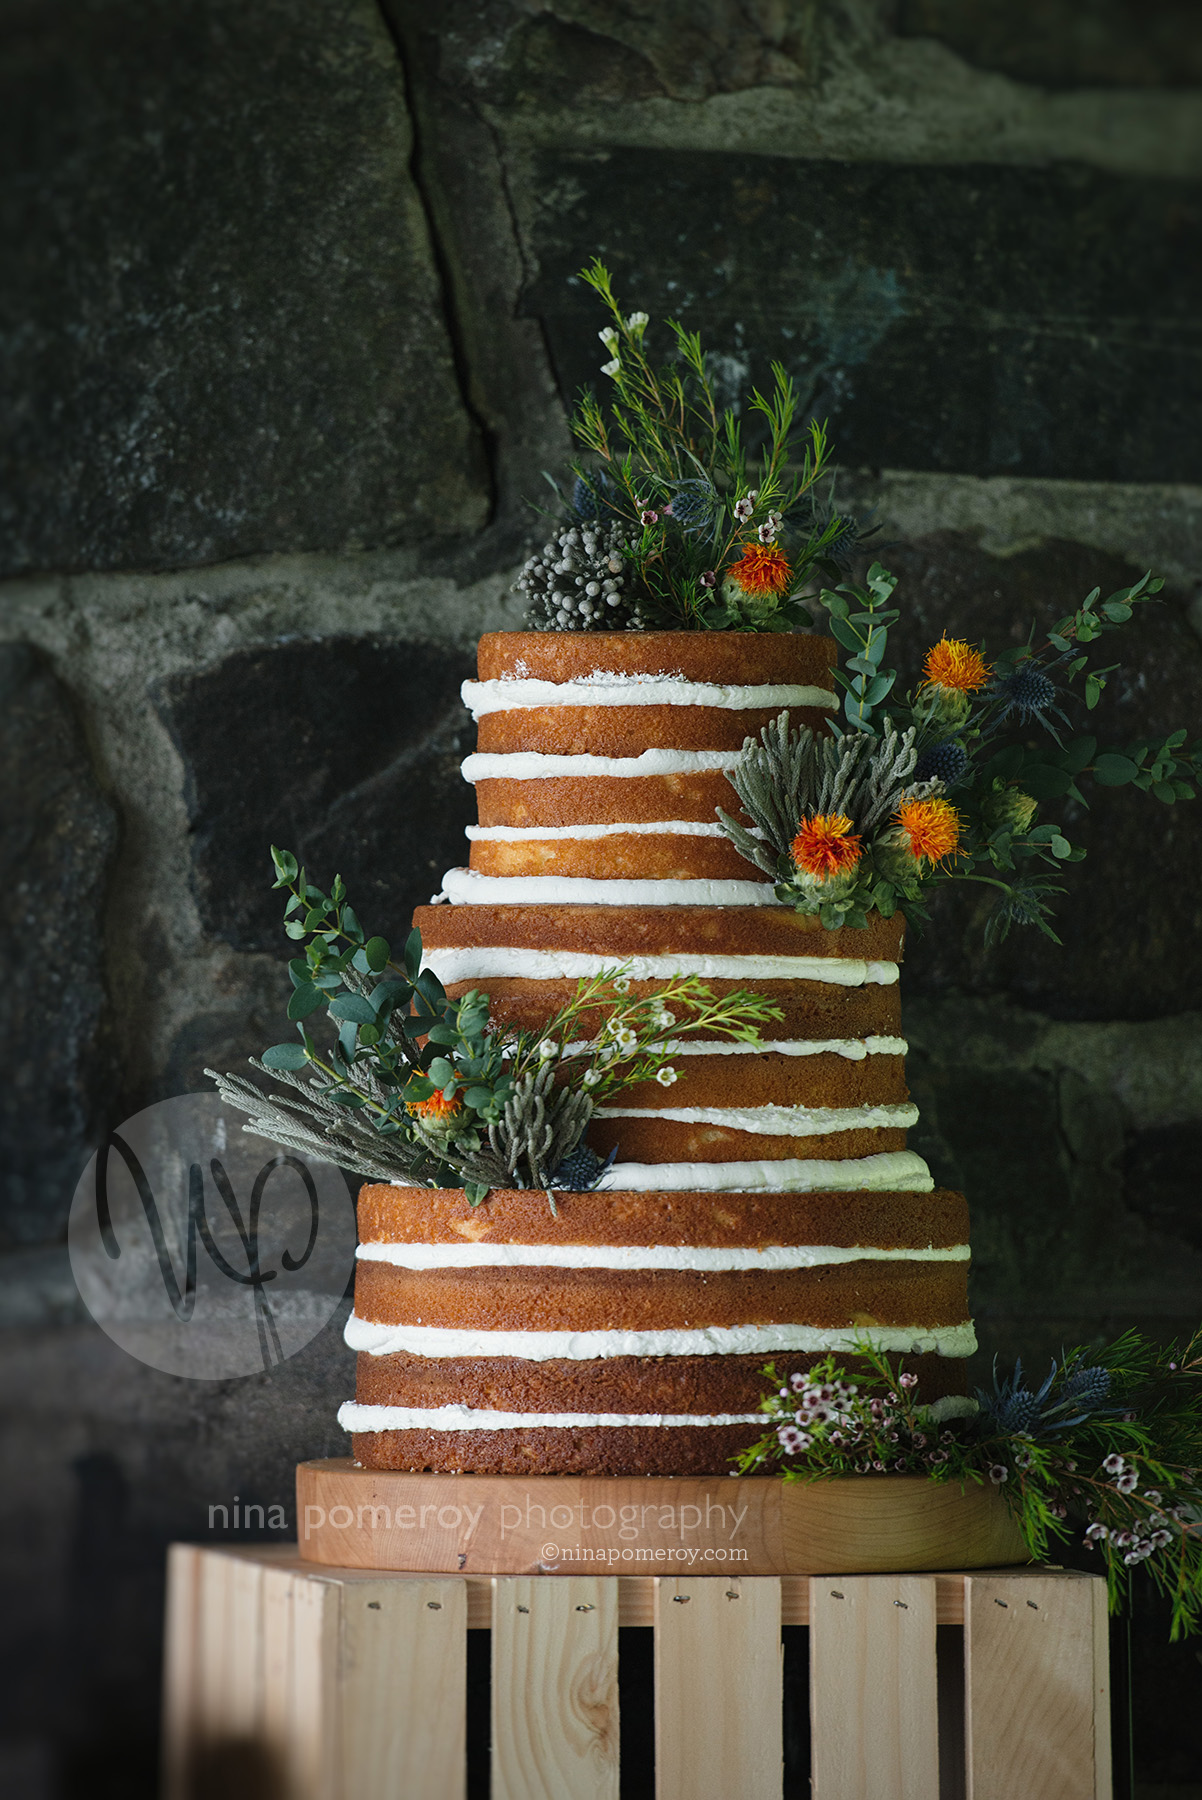 naked un-iced wedding cake embellished with flowers for this beautiful napa garden vineyard wedding taken by photographer nina pomeroy